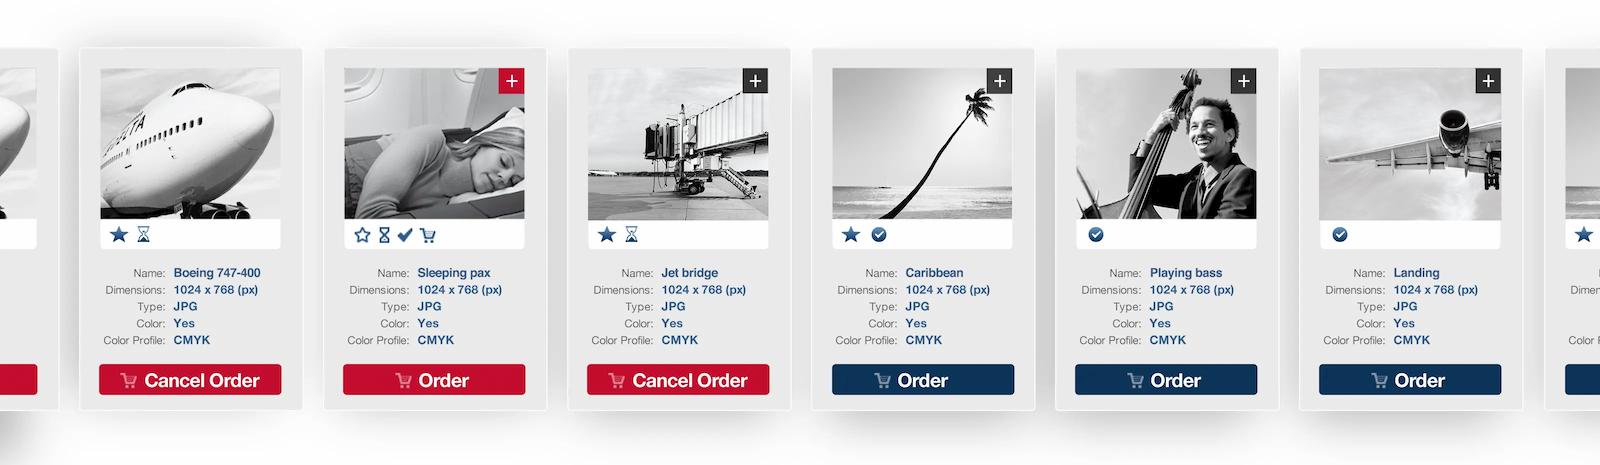 Delta - Orders